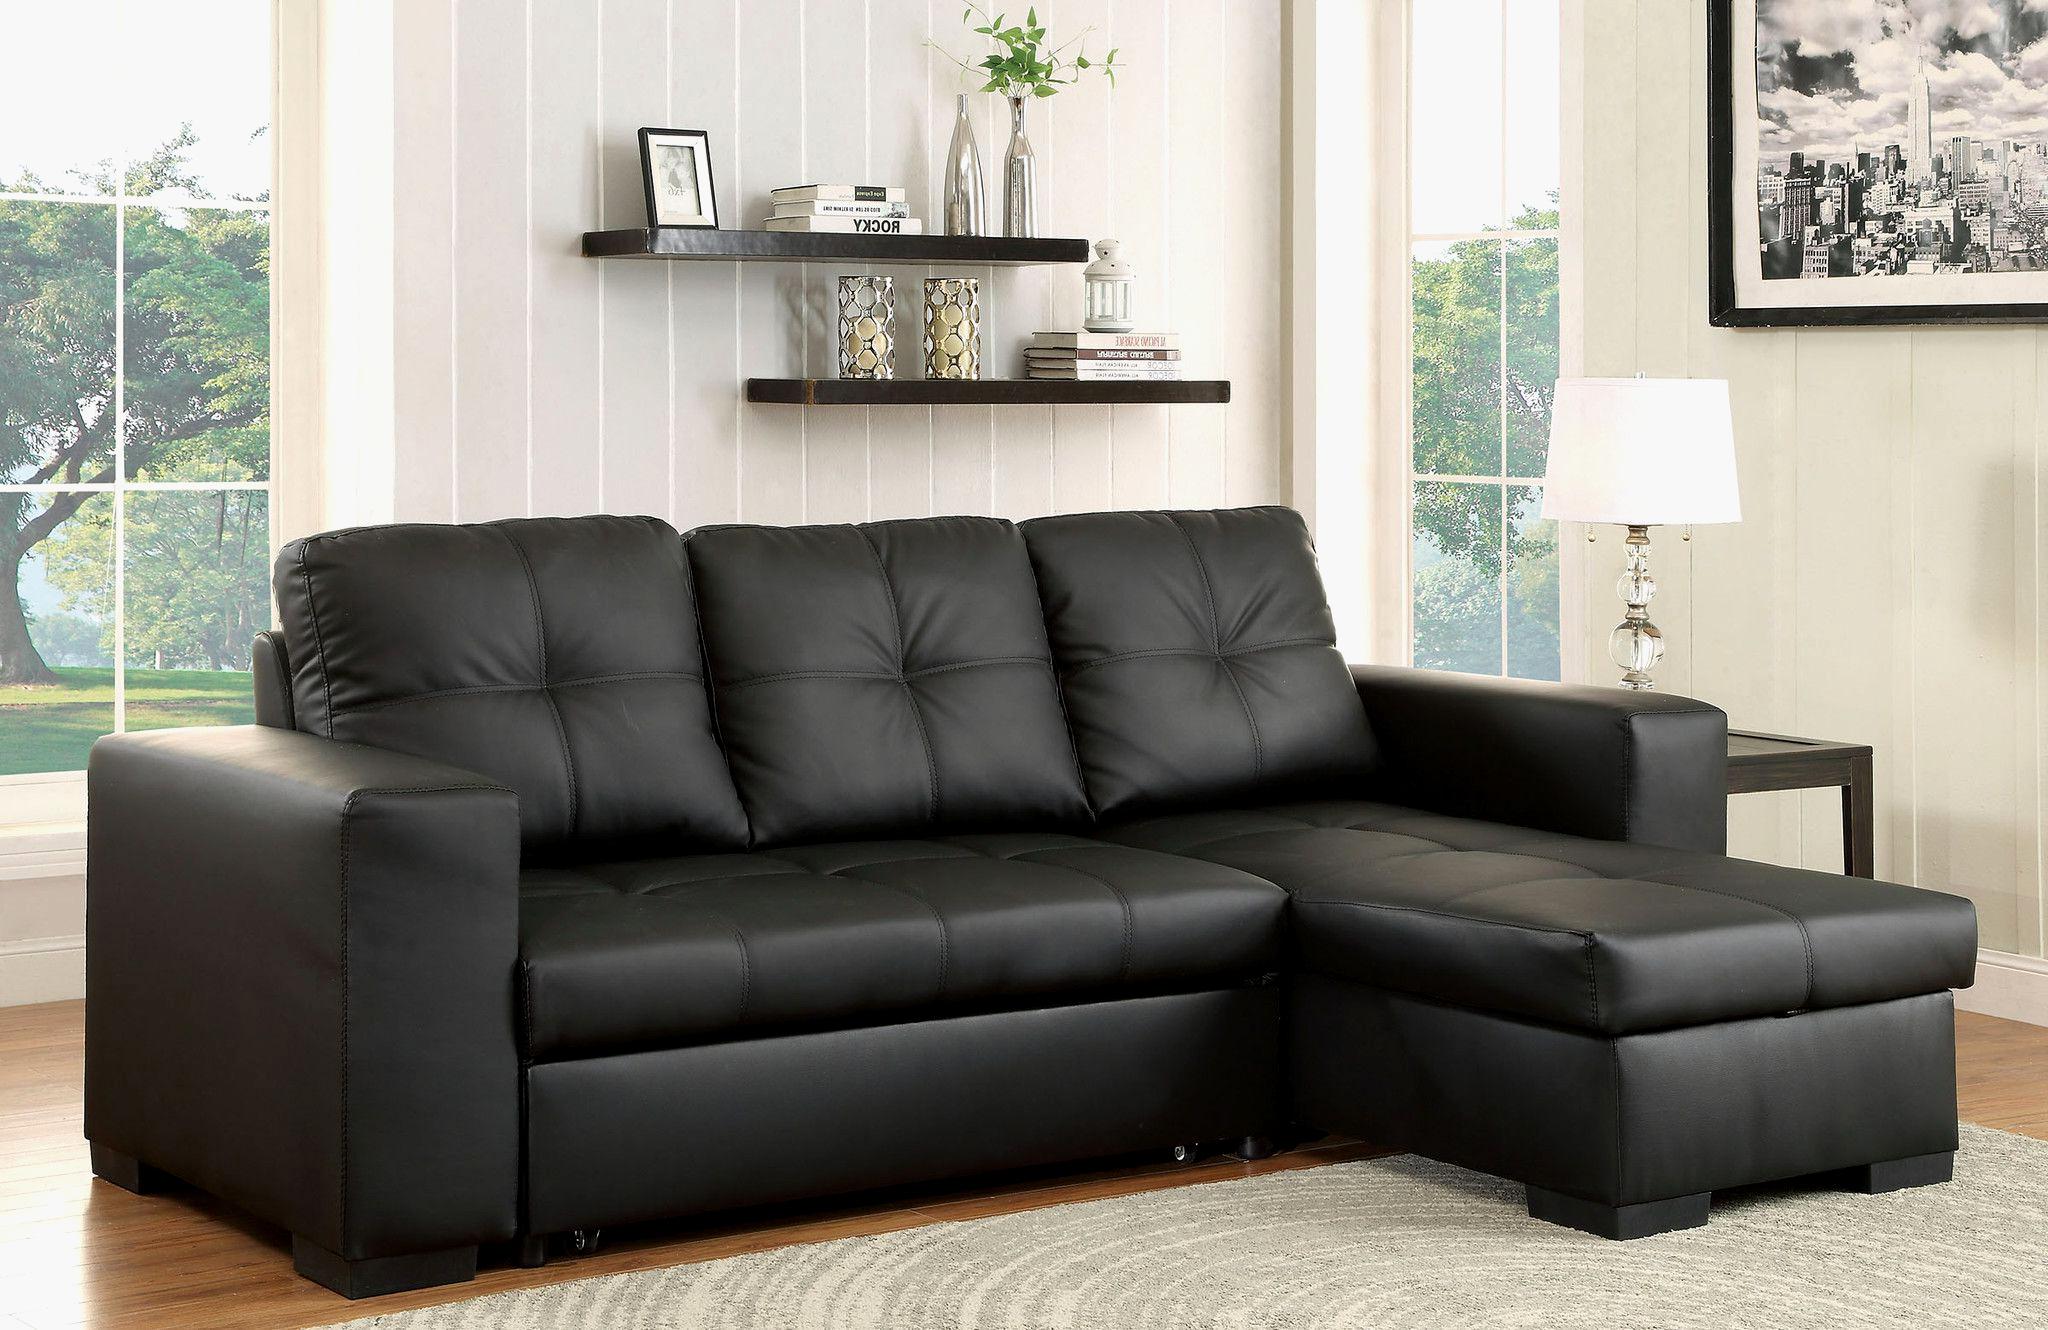 Telas Para Cubrir sofas Xtd6 Telas Para Cubrir sofas Ikea sofas A Medida Sevilla sofas A Medida